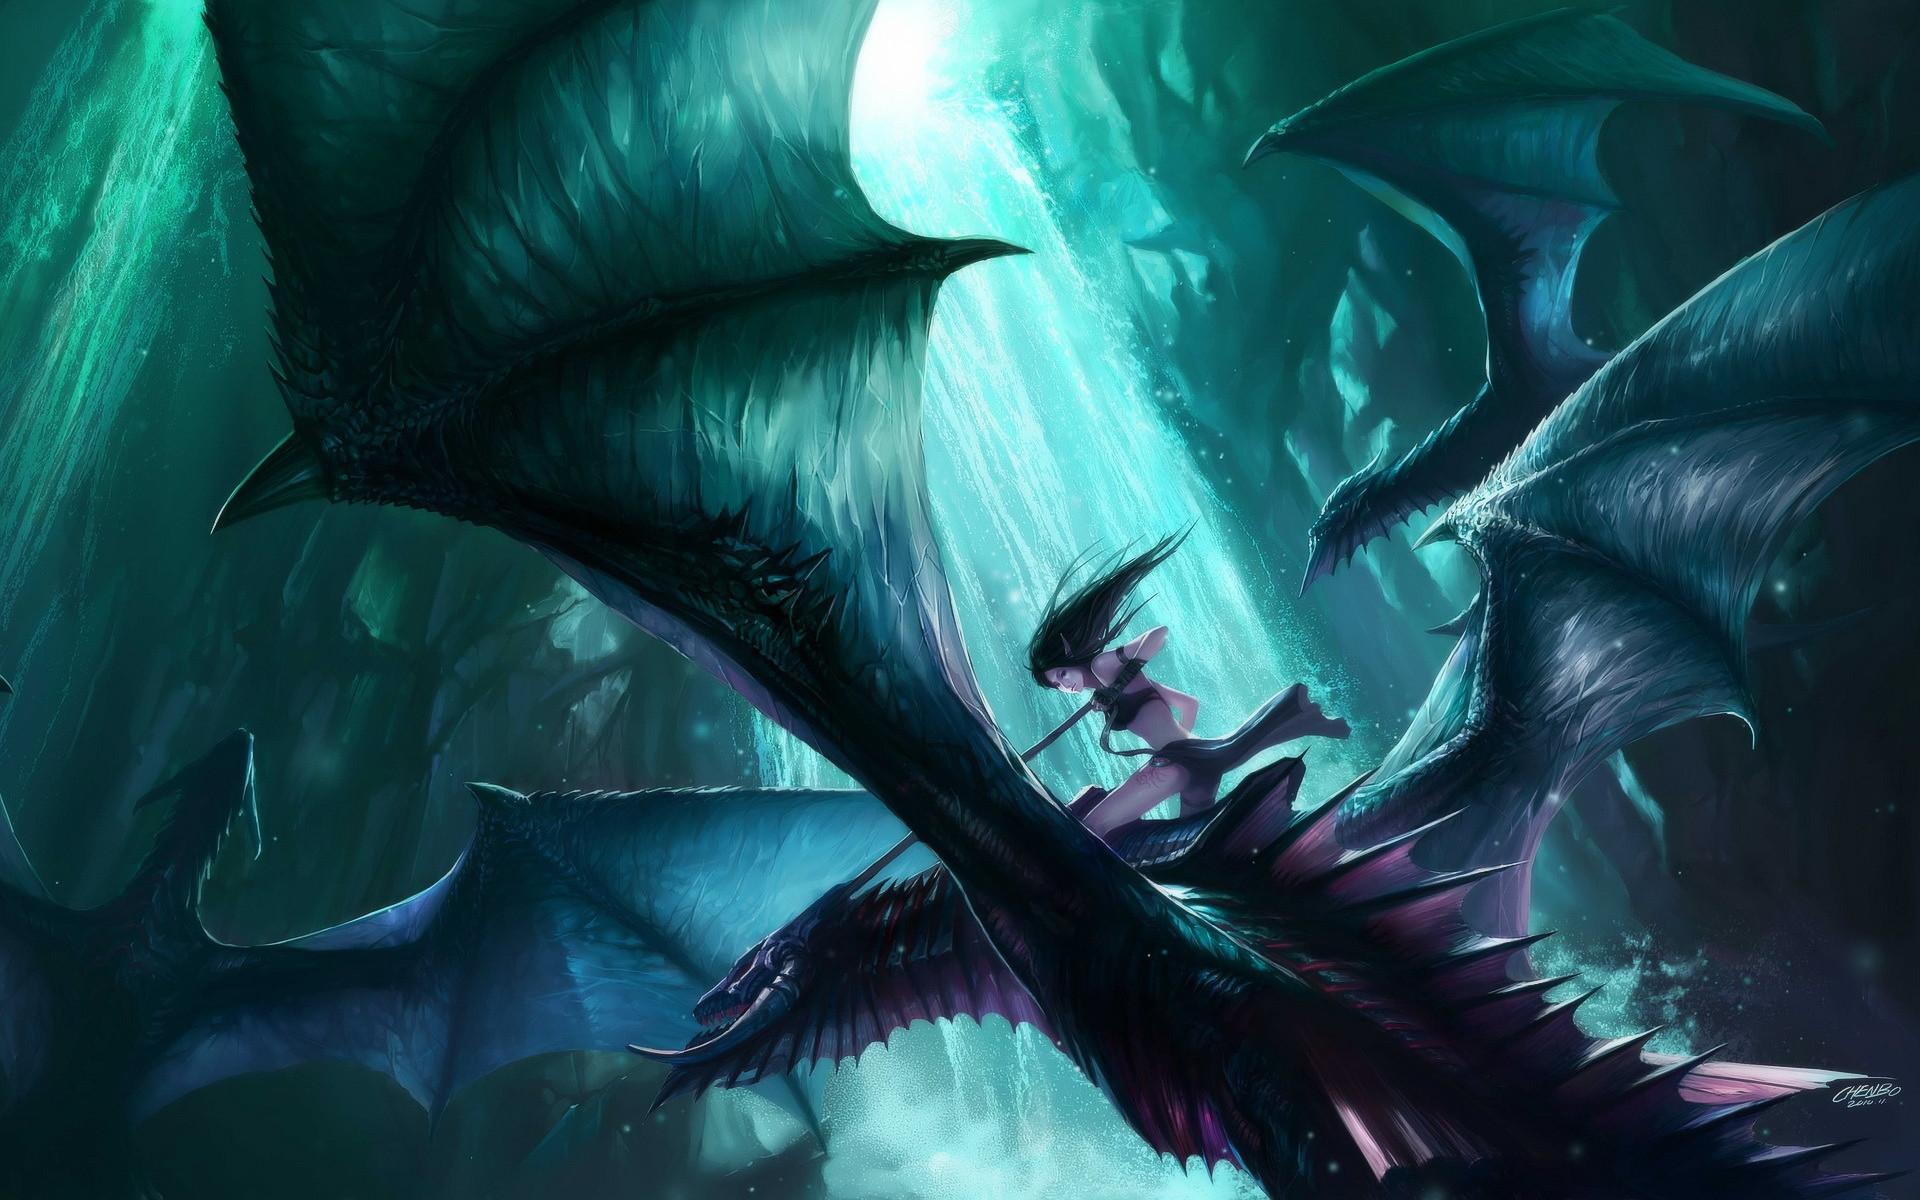 Red Dragon wallpapers women | dragon rider Wallpaper Background | 26623